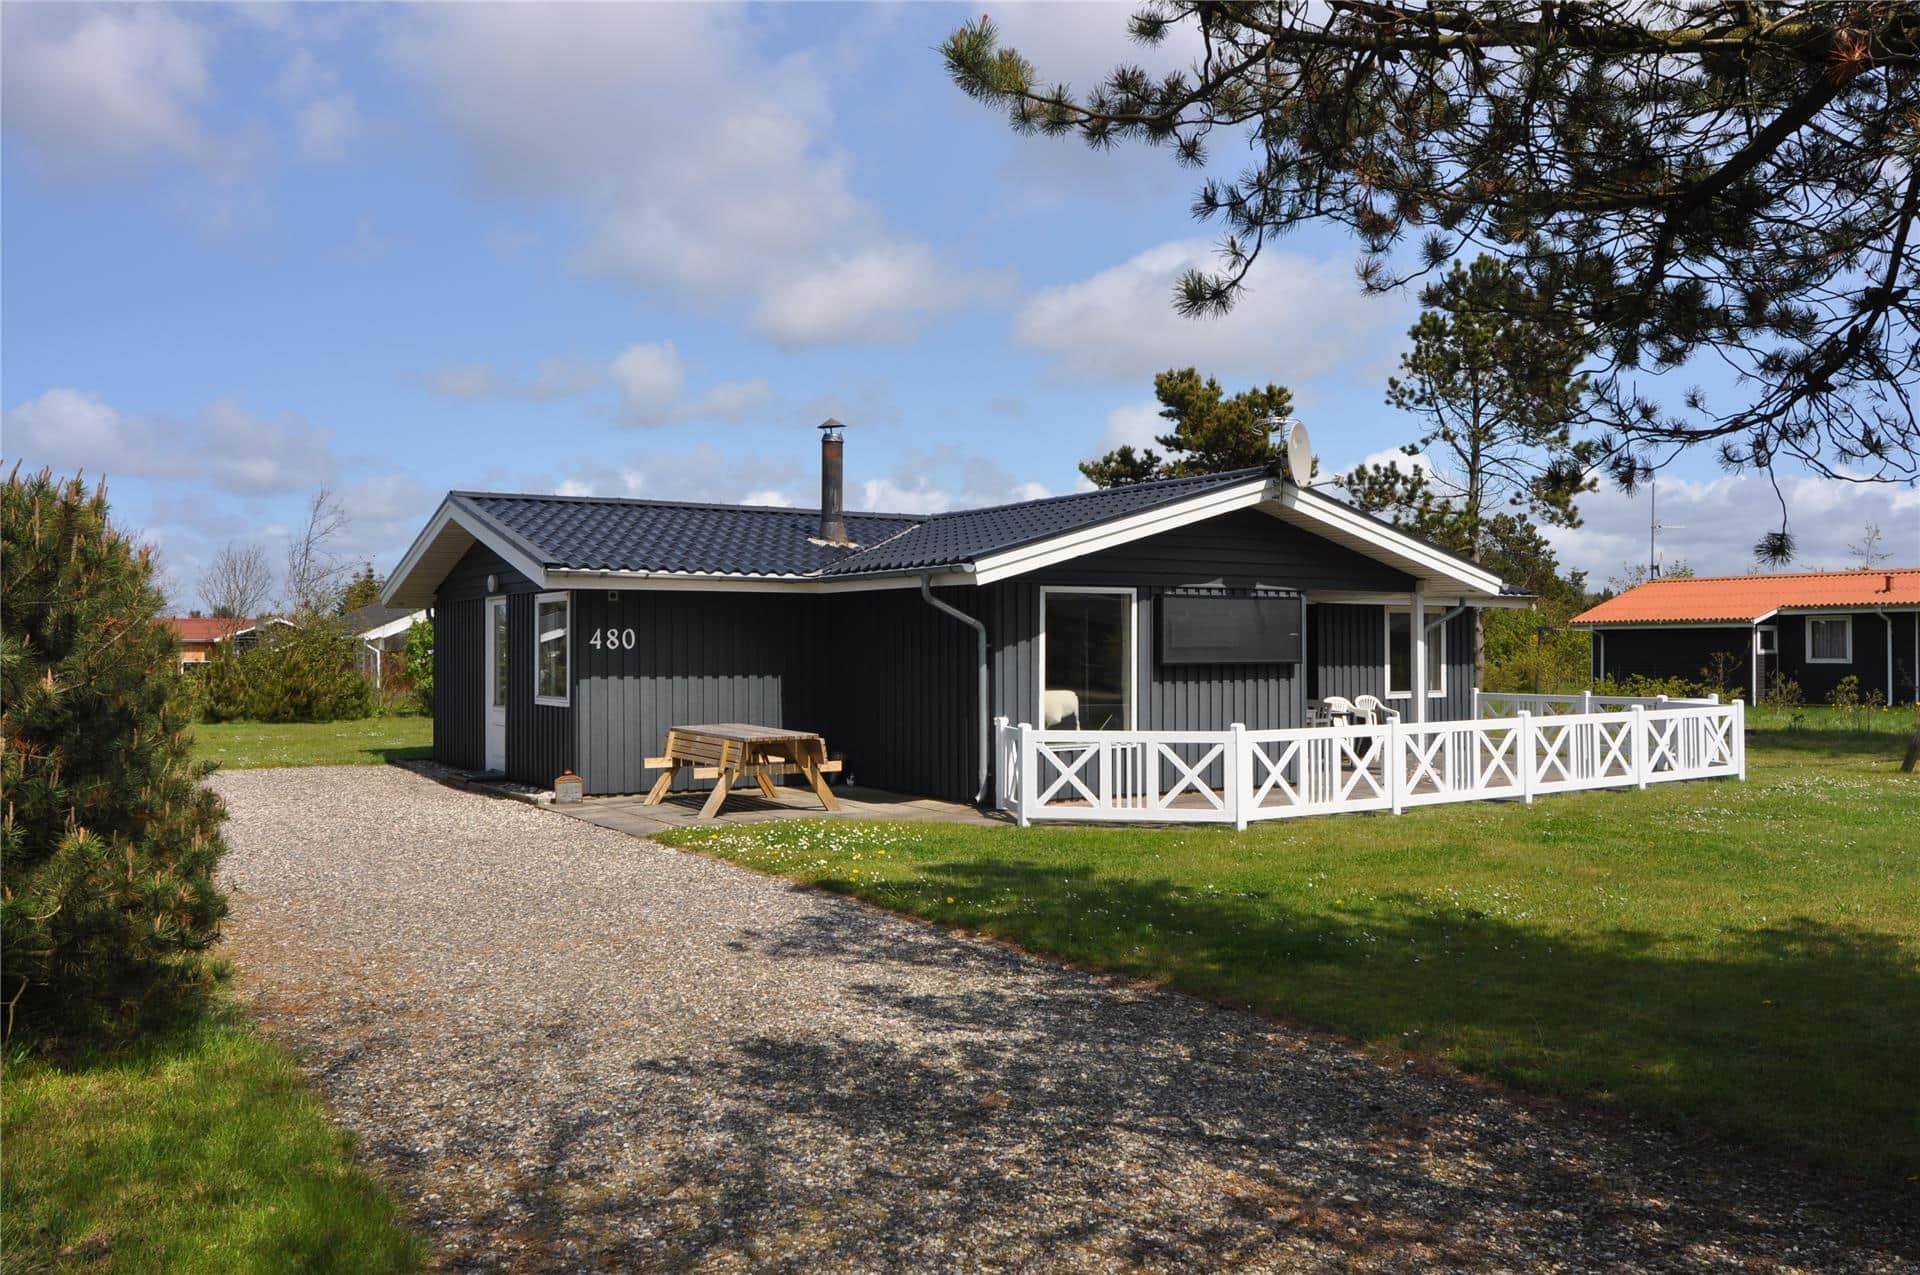 Bild 1-175 Ferienhaus 30826, Kløvervej 480, DK - 6990 Ulfborg